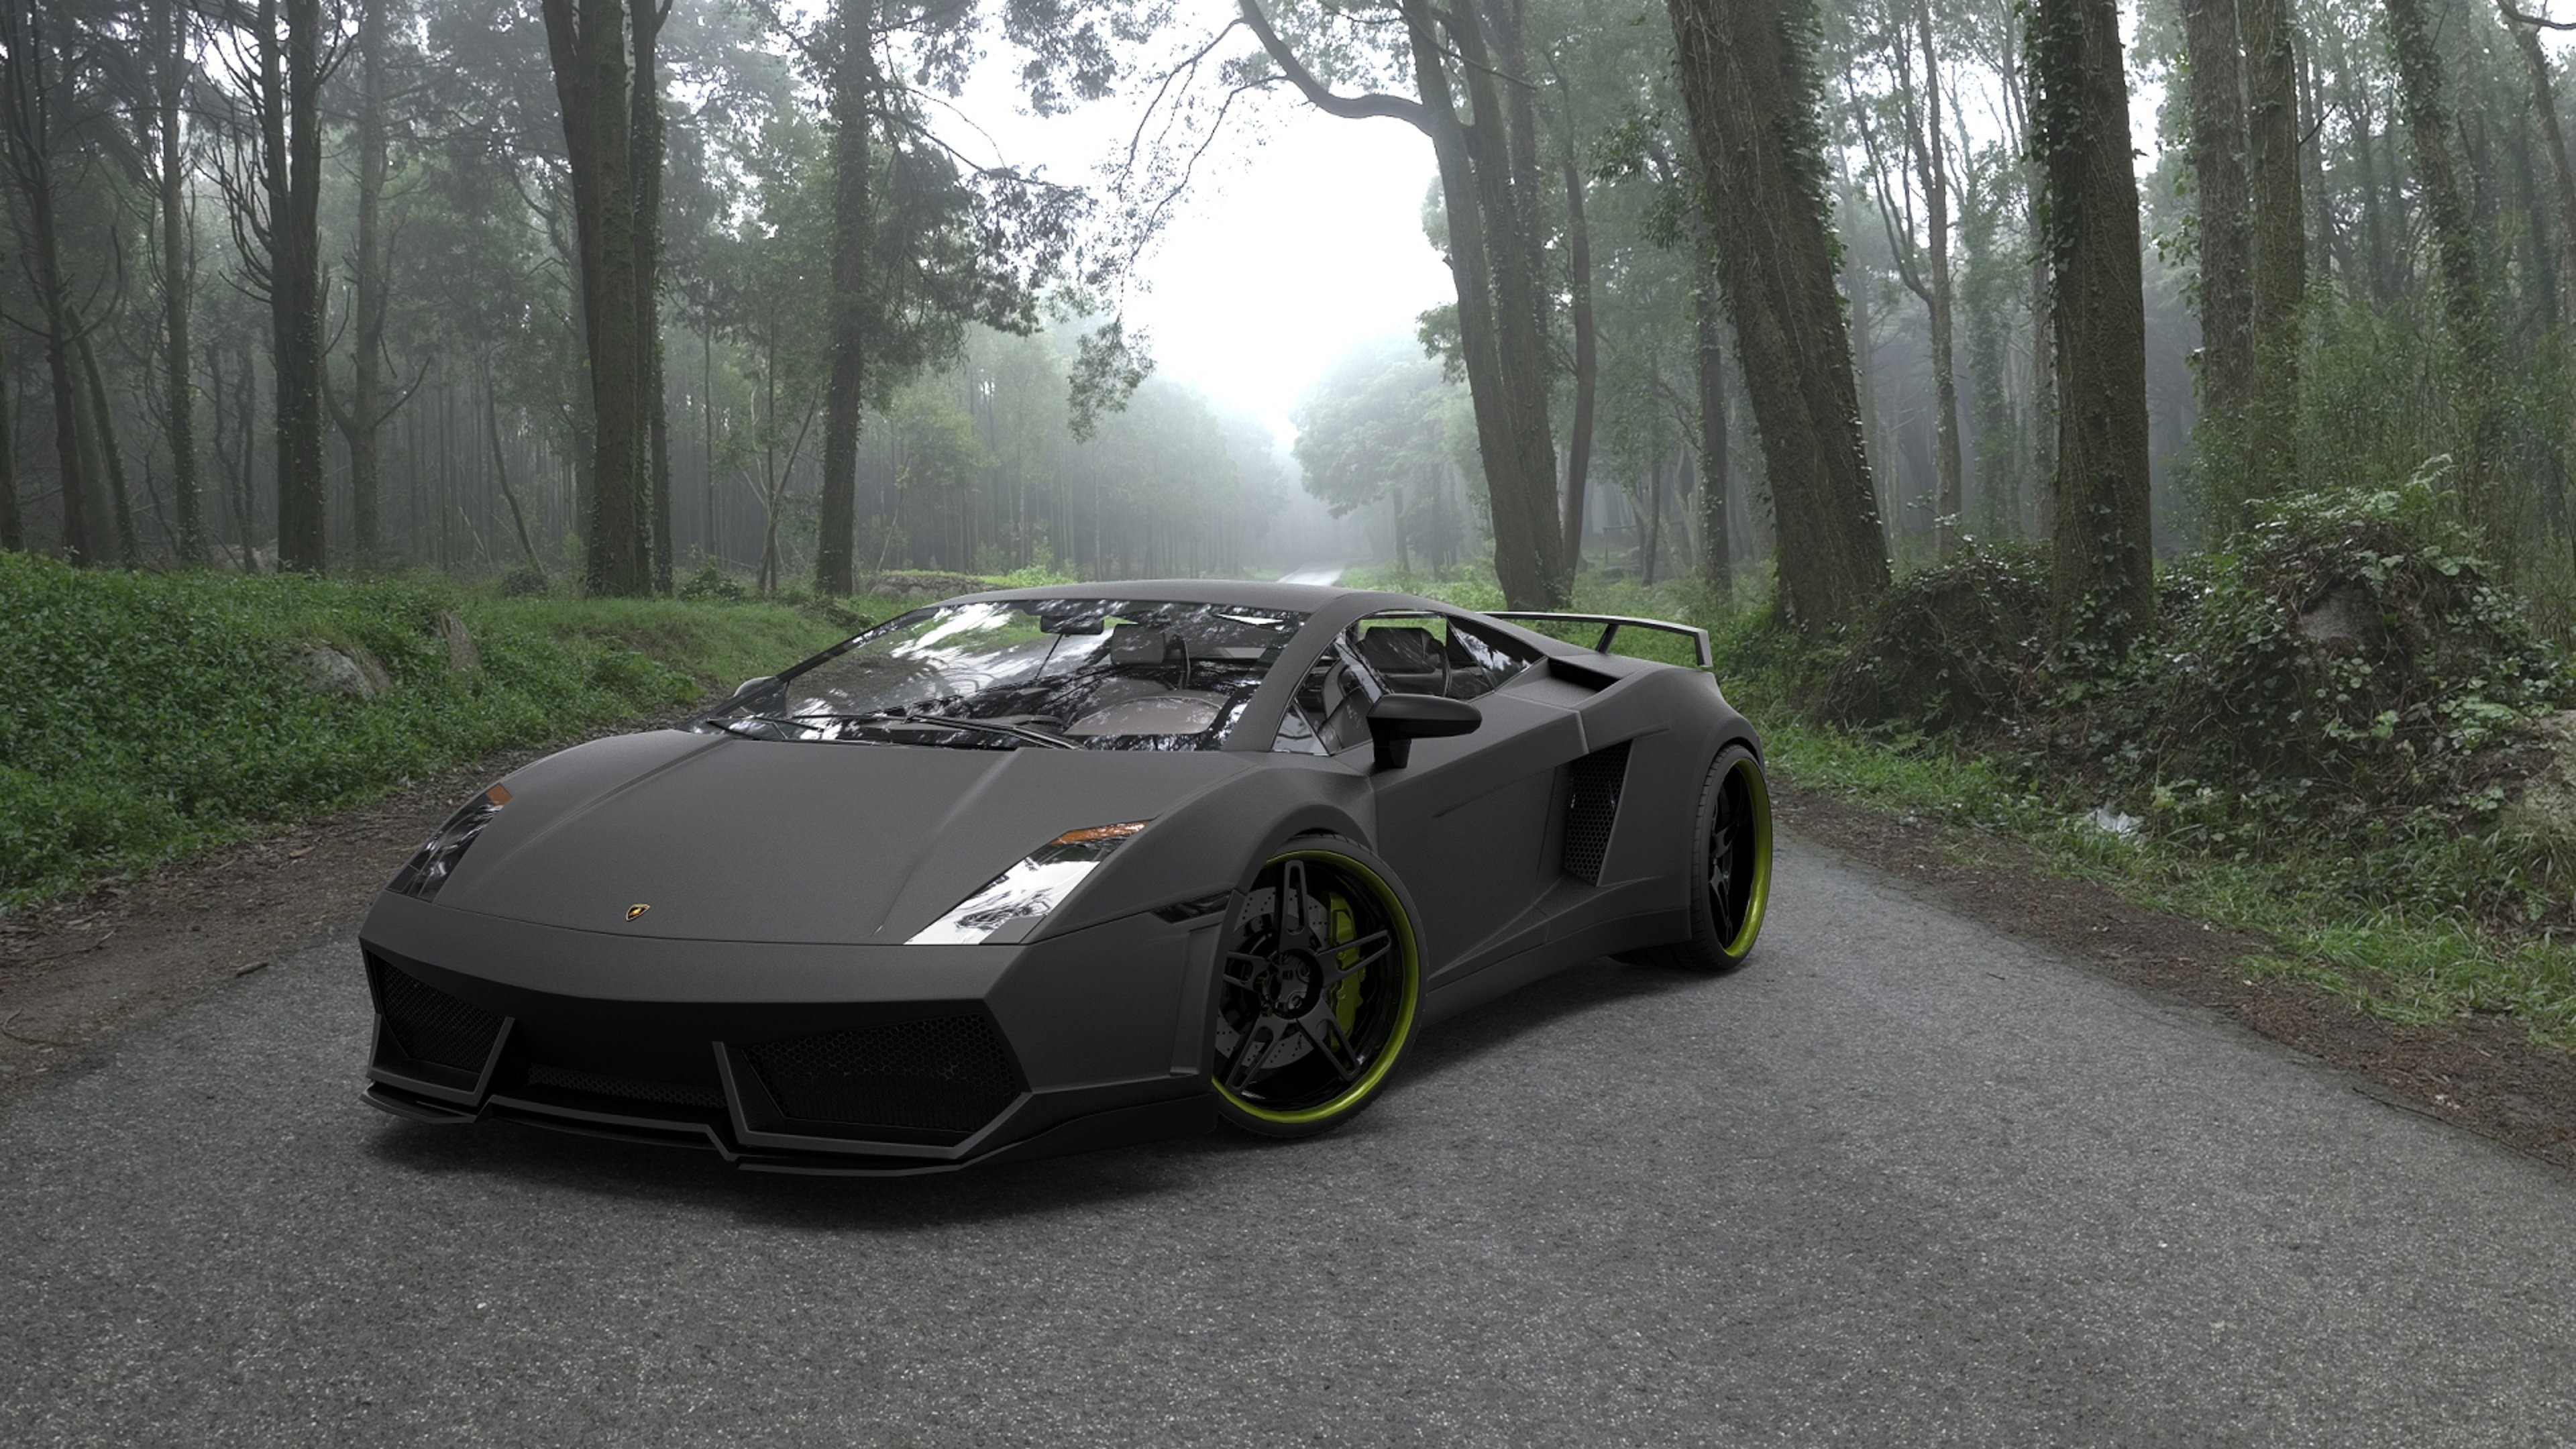 Black Lykan Hypersport kommt in den USA an Auto Modelle